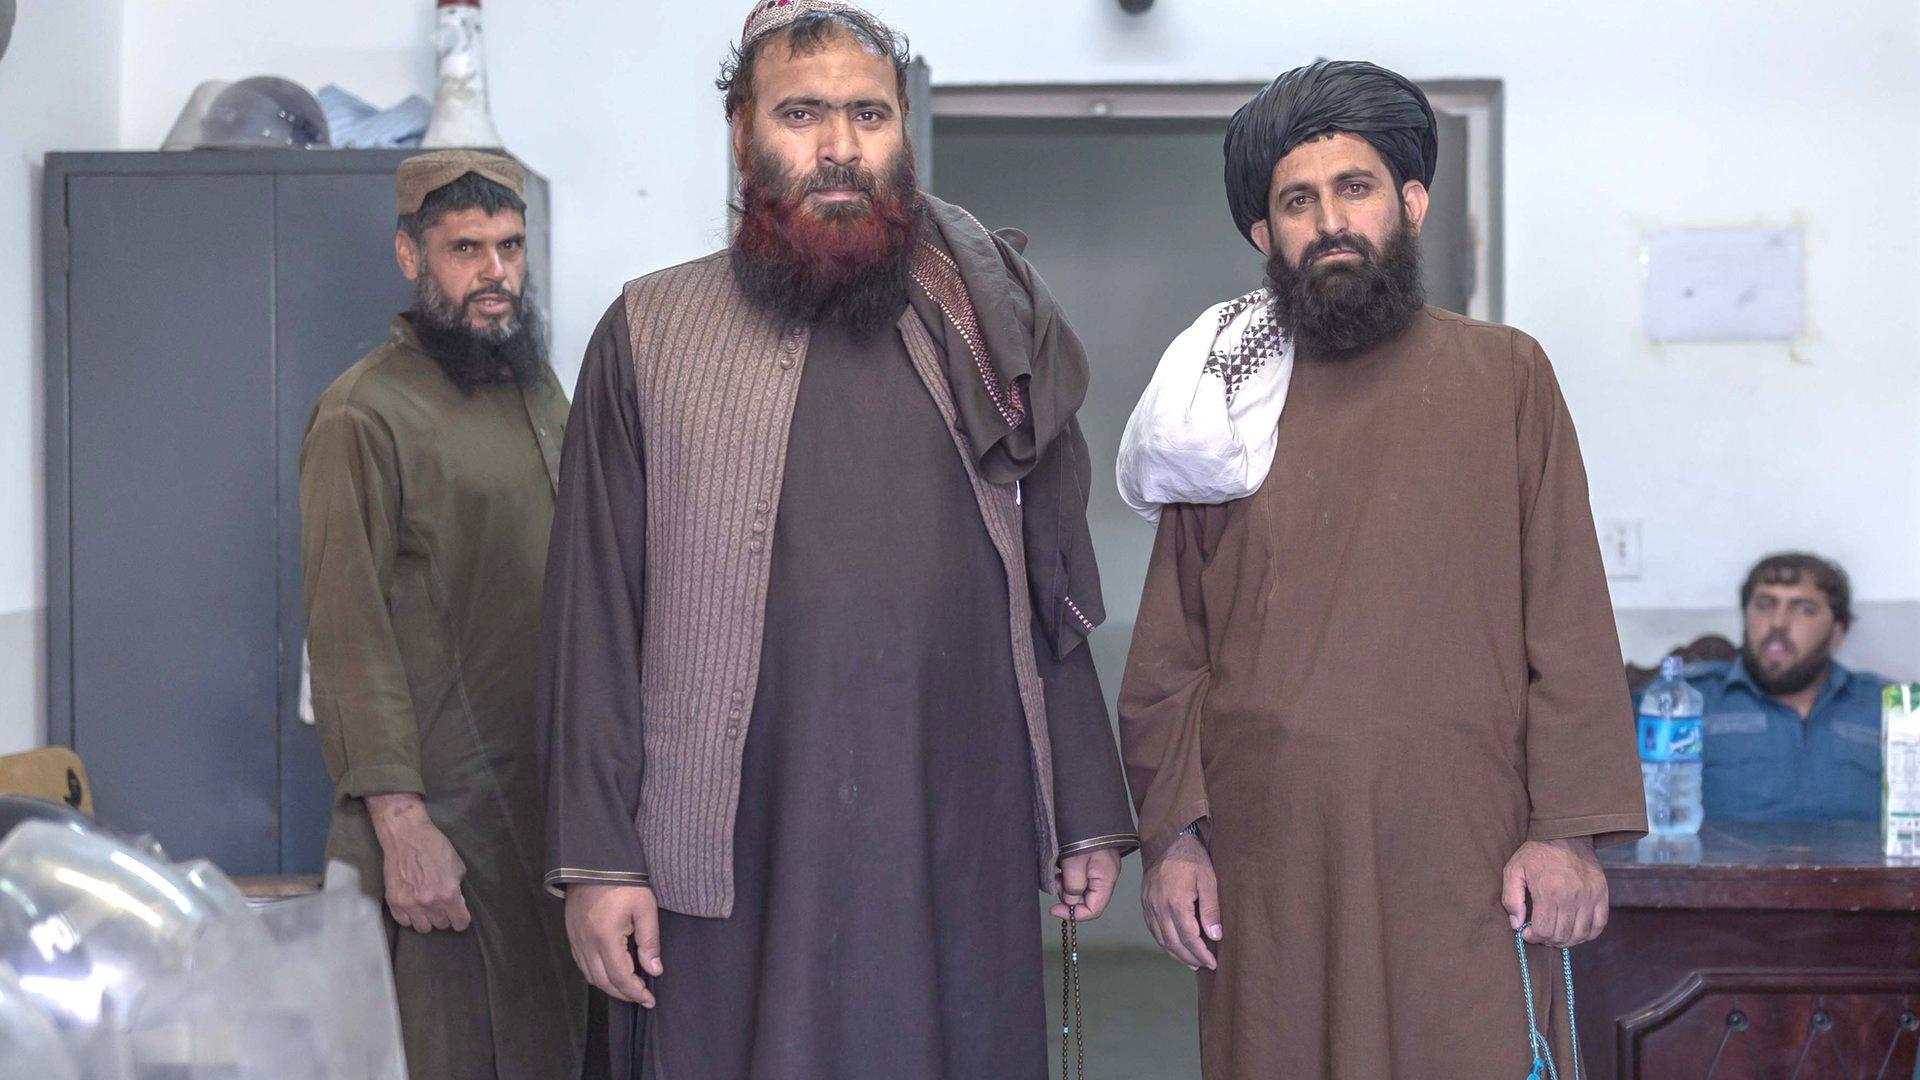 Mawlawi Fazel Bari (right) with another Taliban prisoner